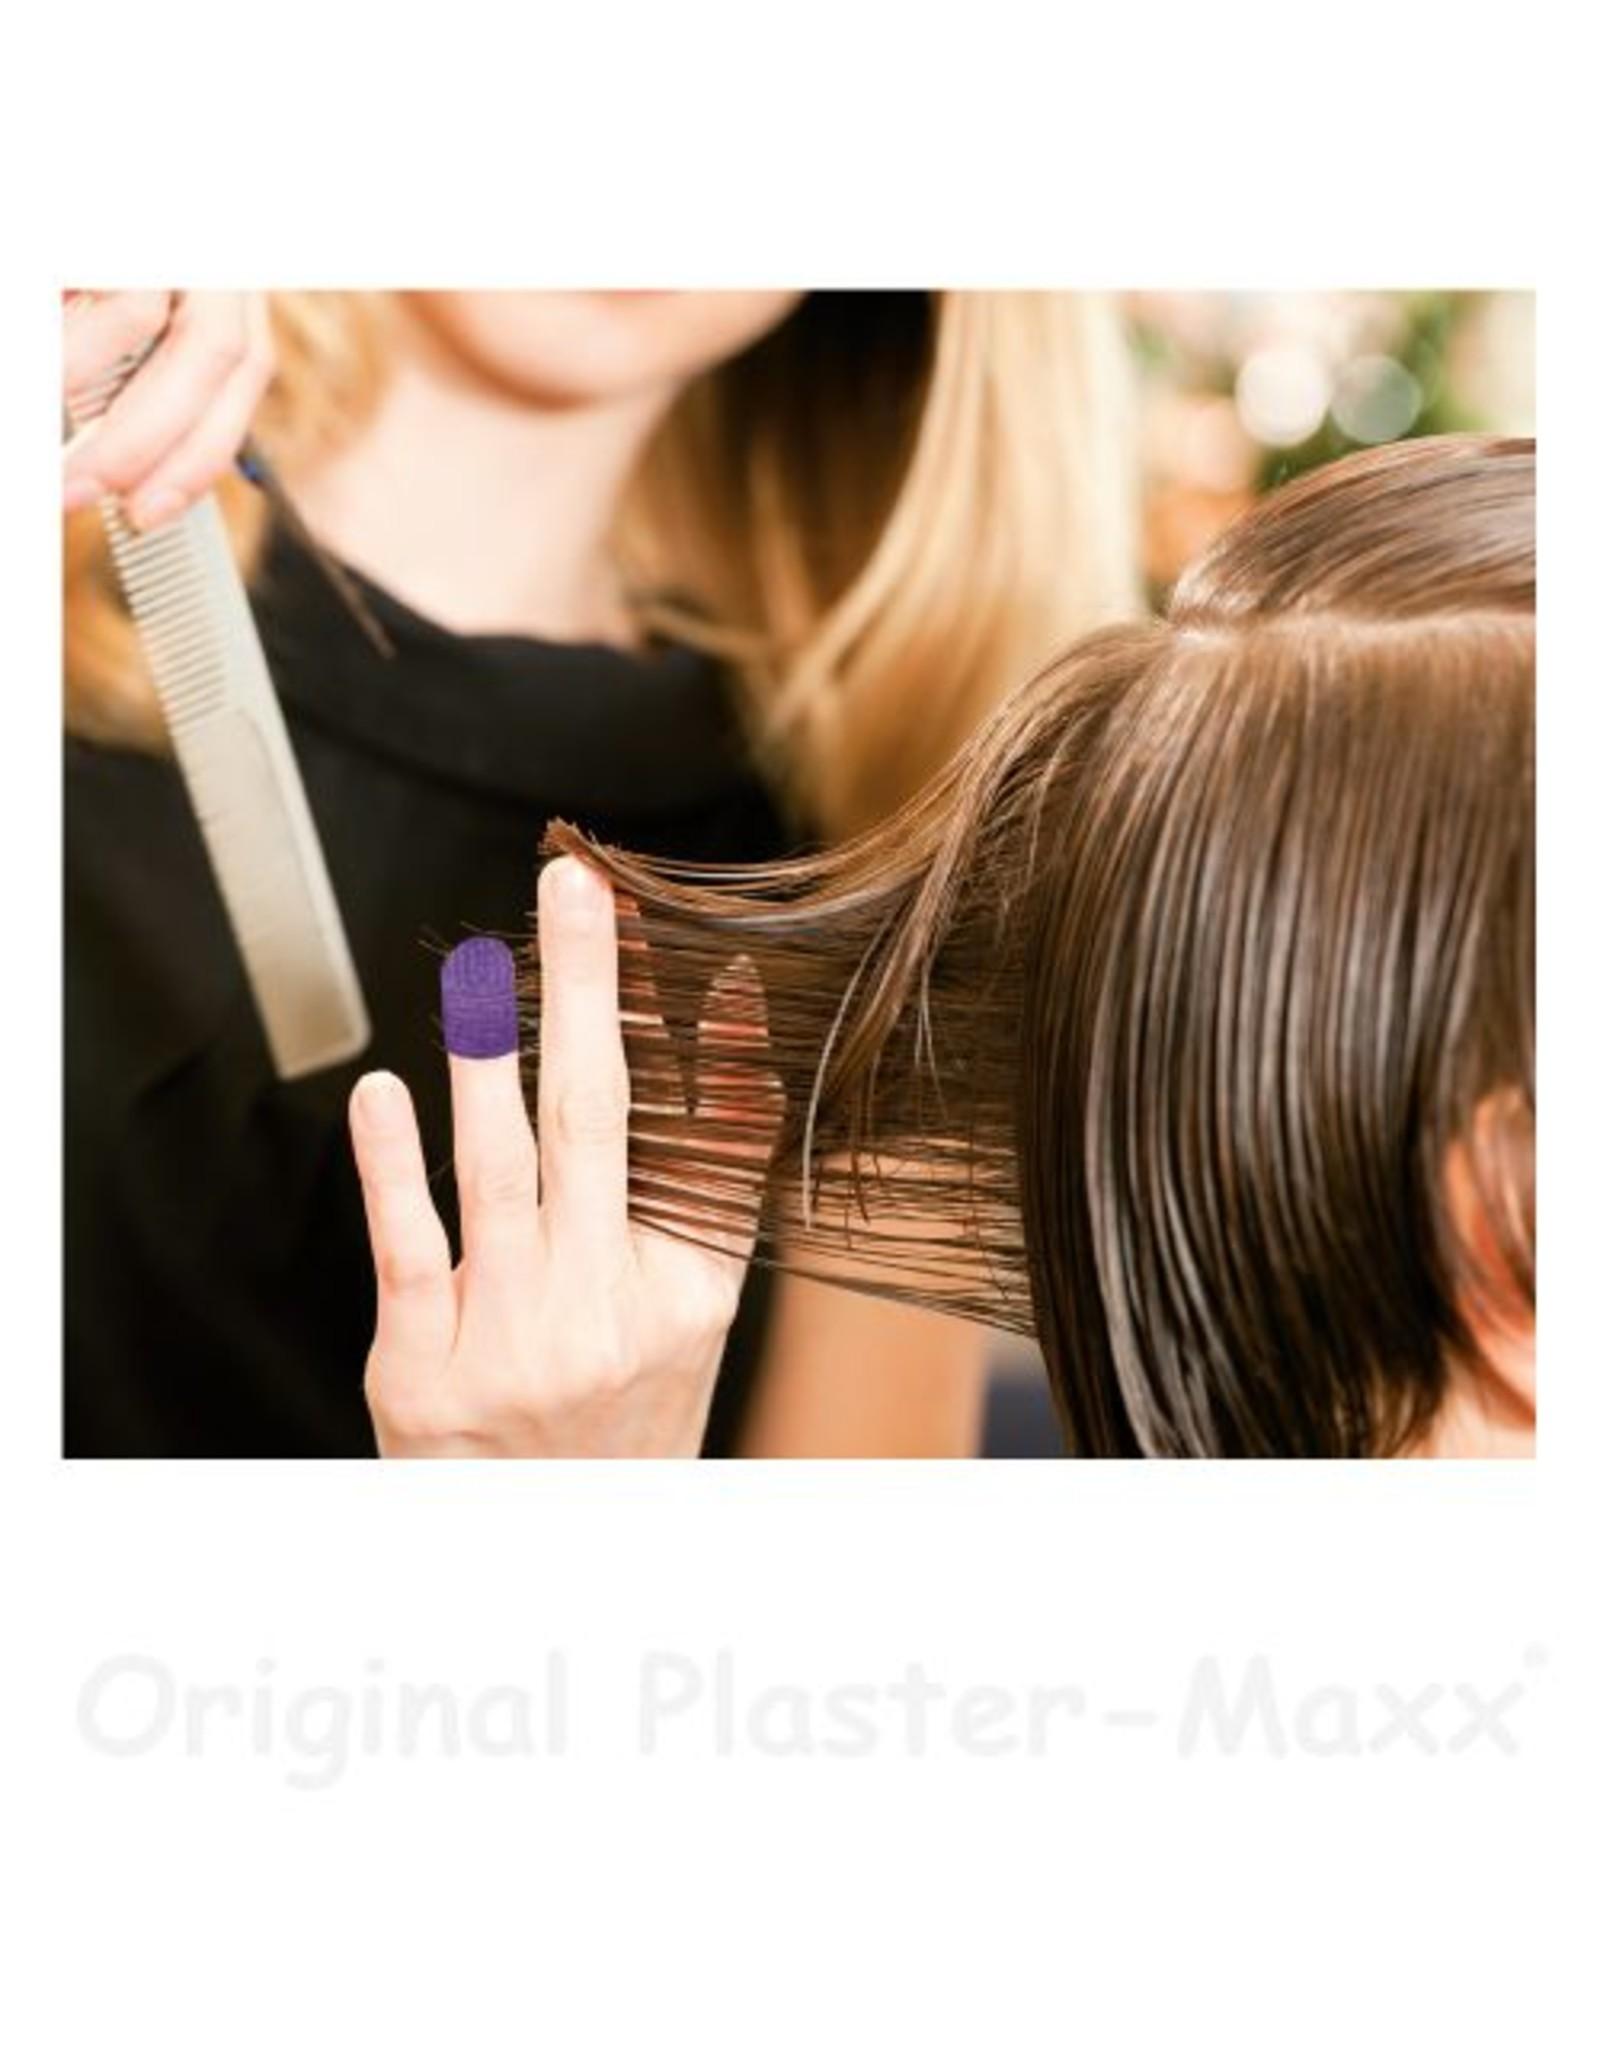 Plaster-Maxx Plaster-Maxx - Valueset 1xSkin, 1xRed, 1xBlue